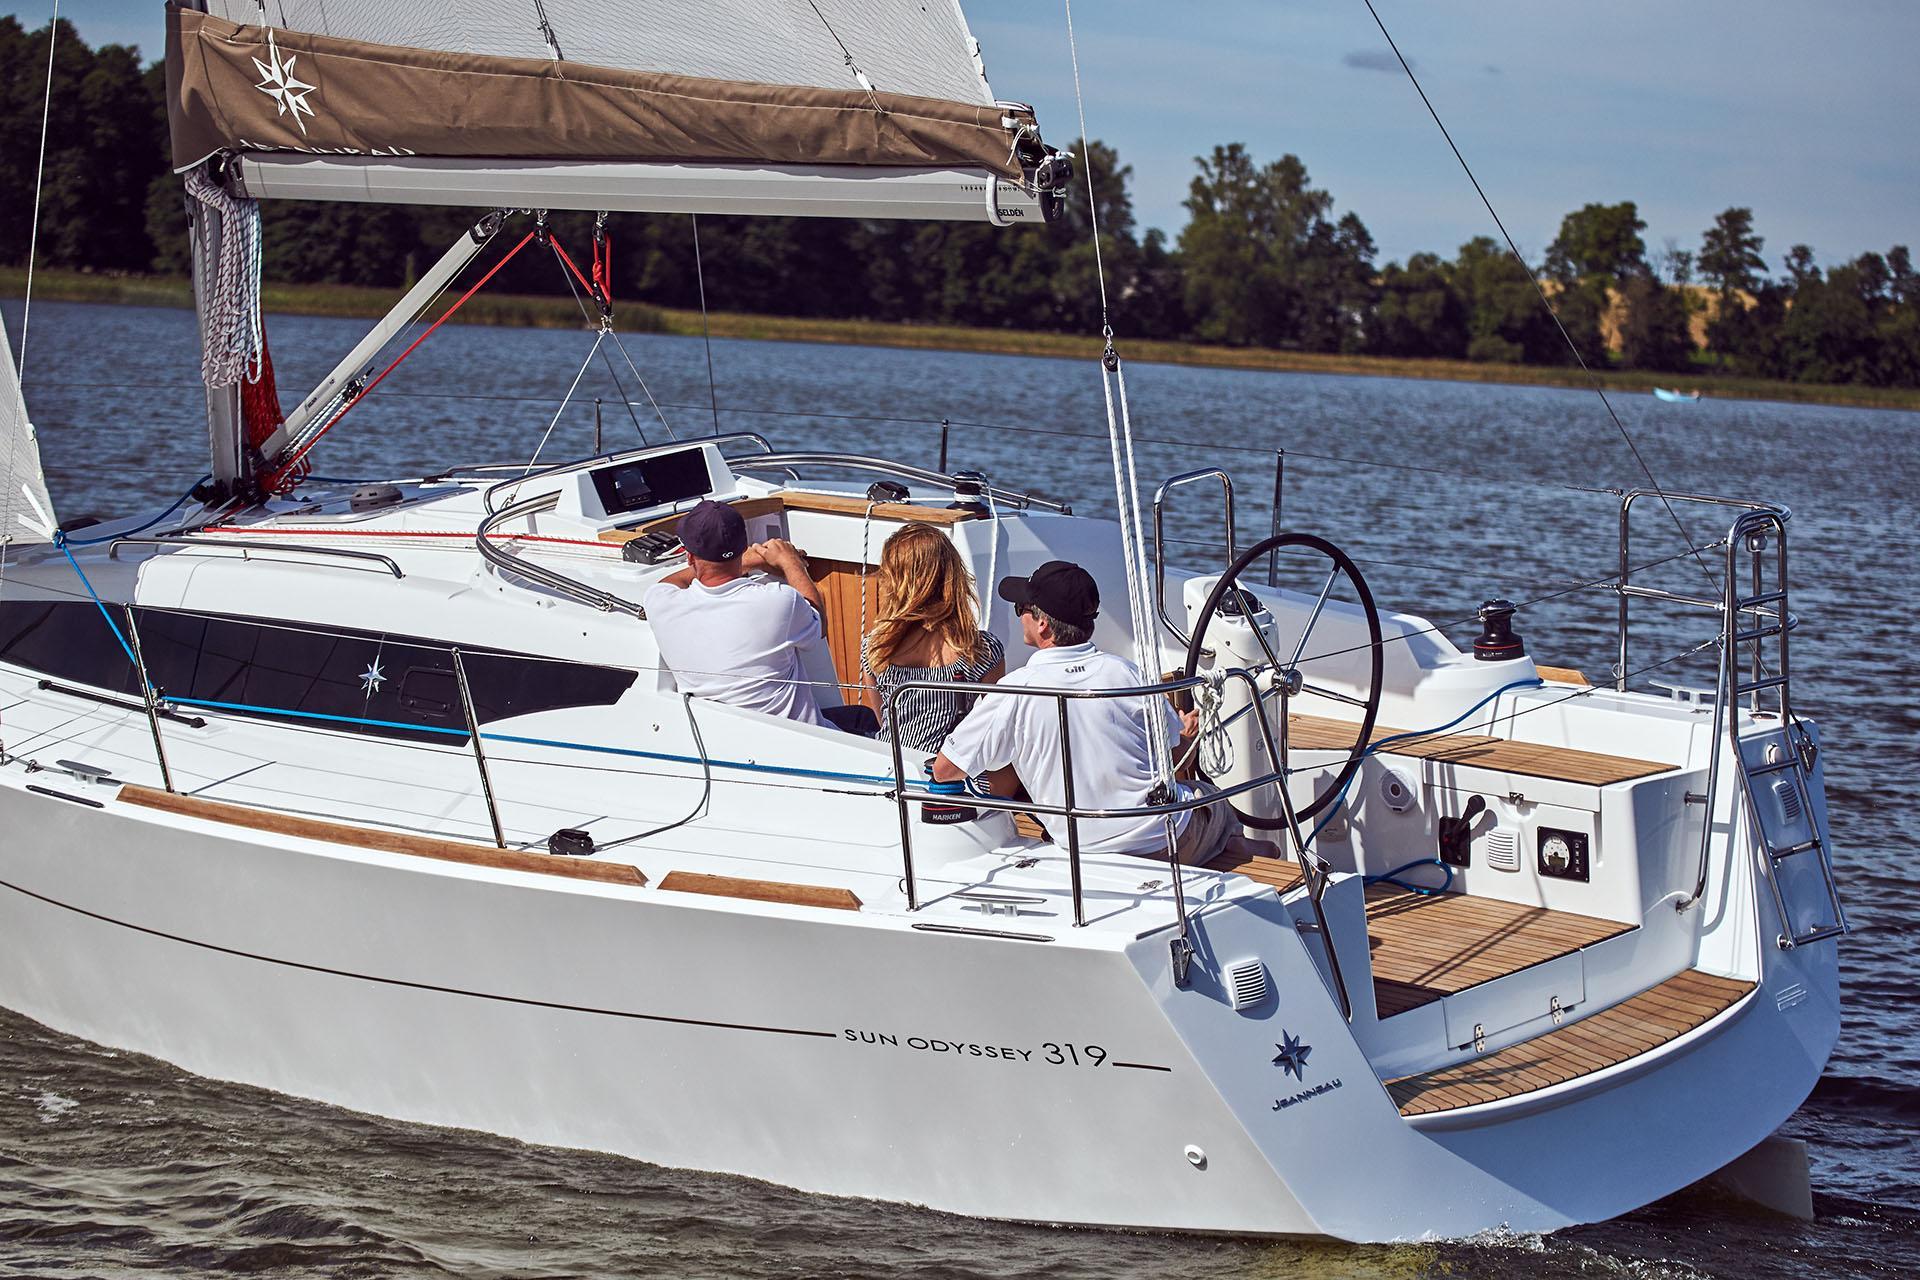 Sun Odyssey 319 Jeanneau Boats